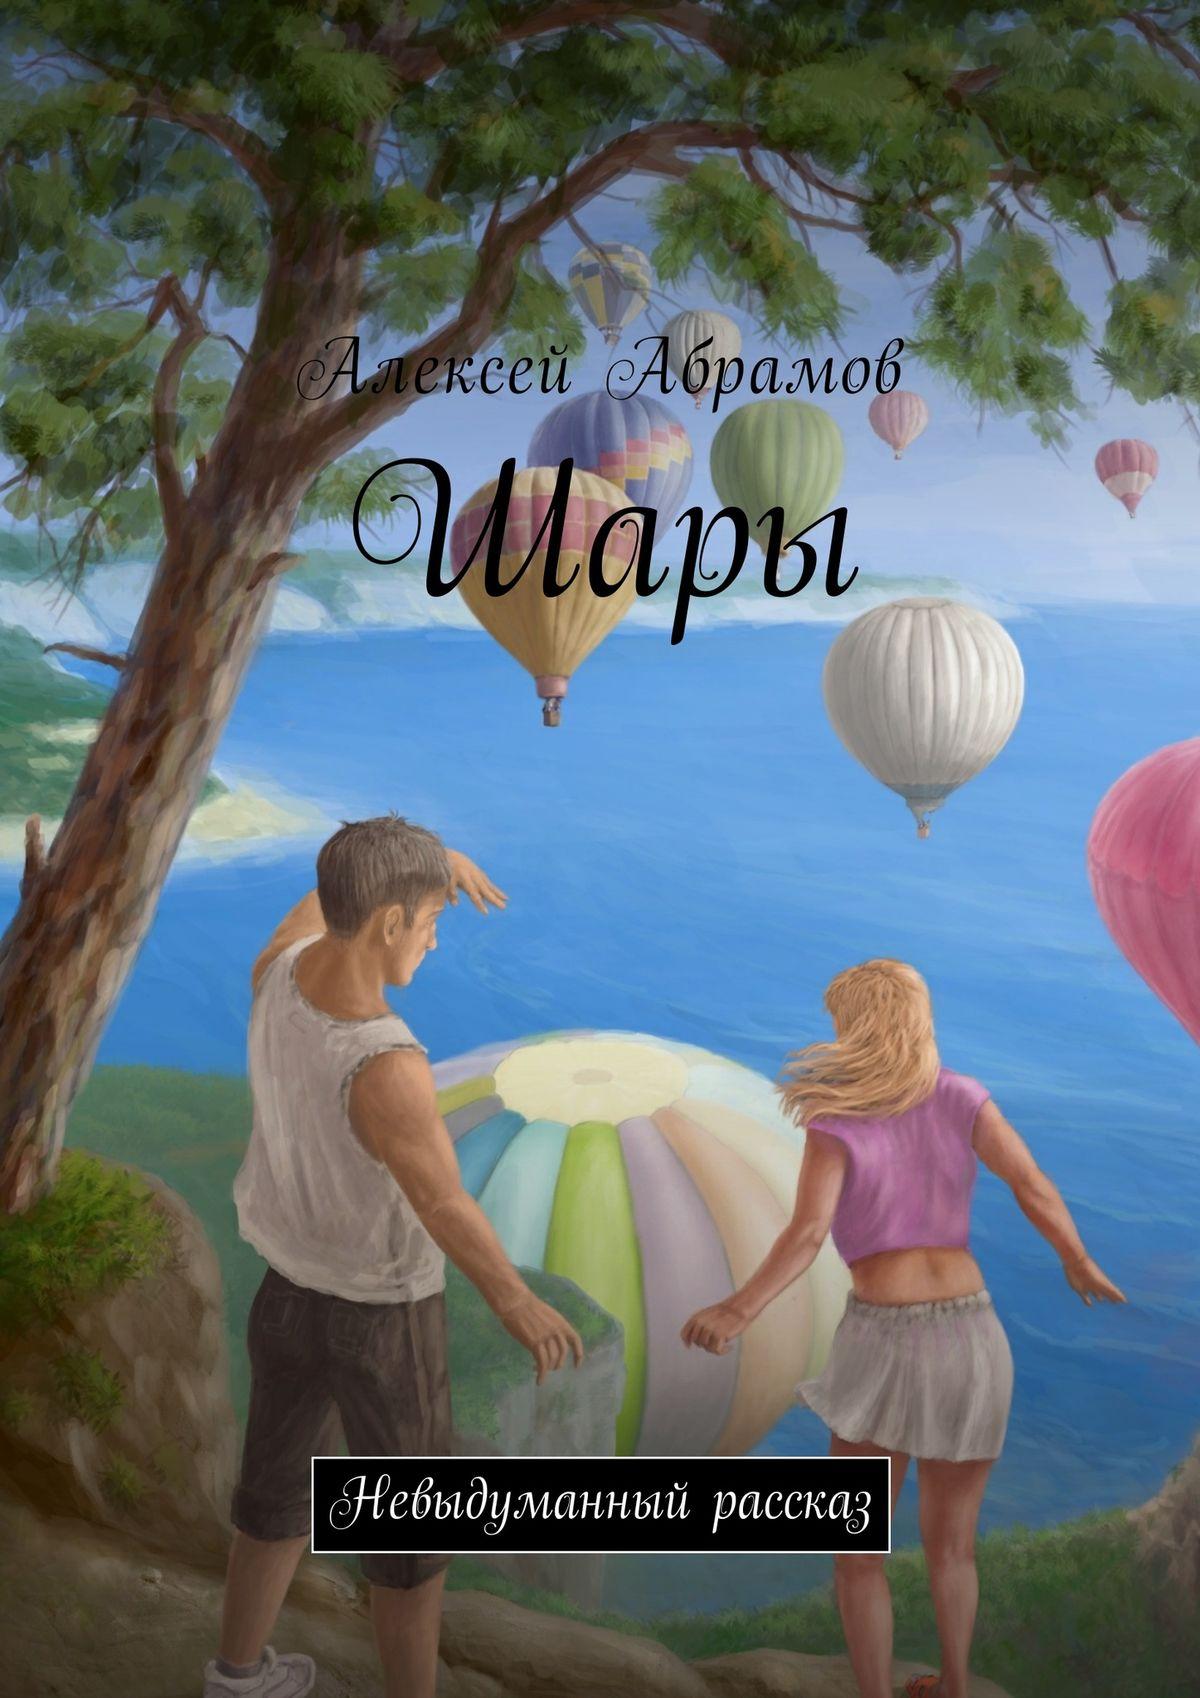 Алексей Абрамов Шары. Невыдуманный рассказ